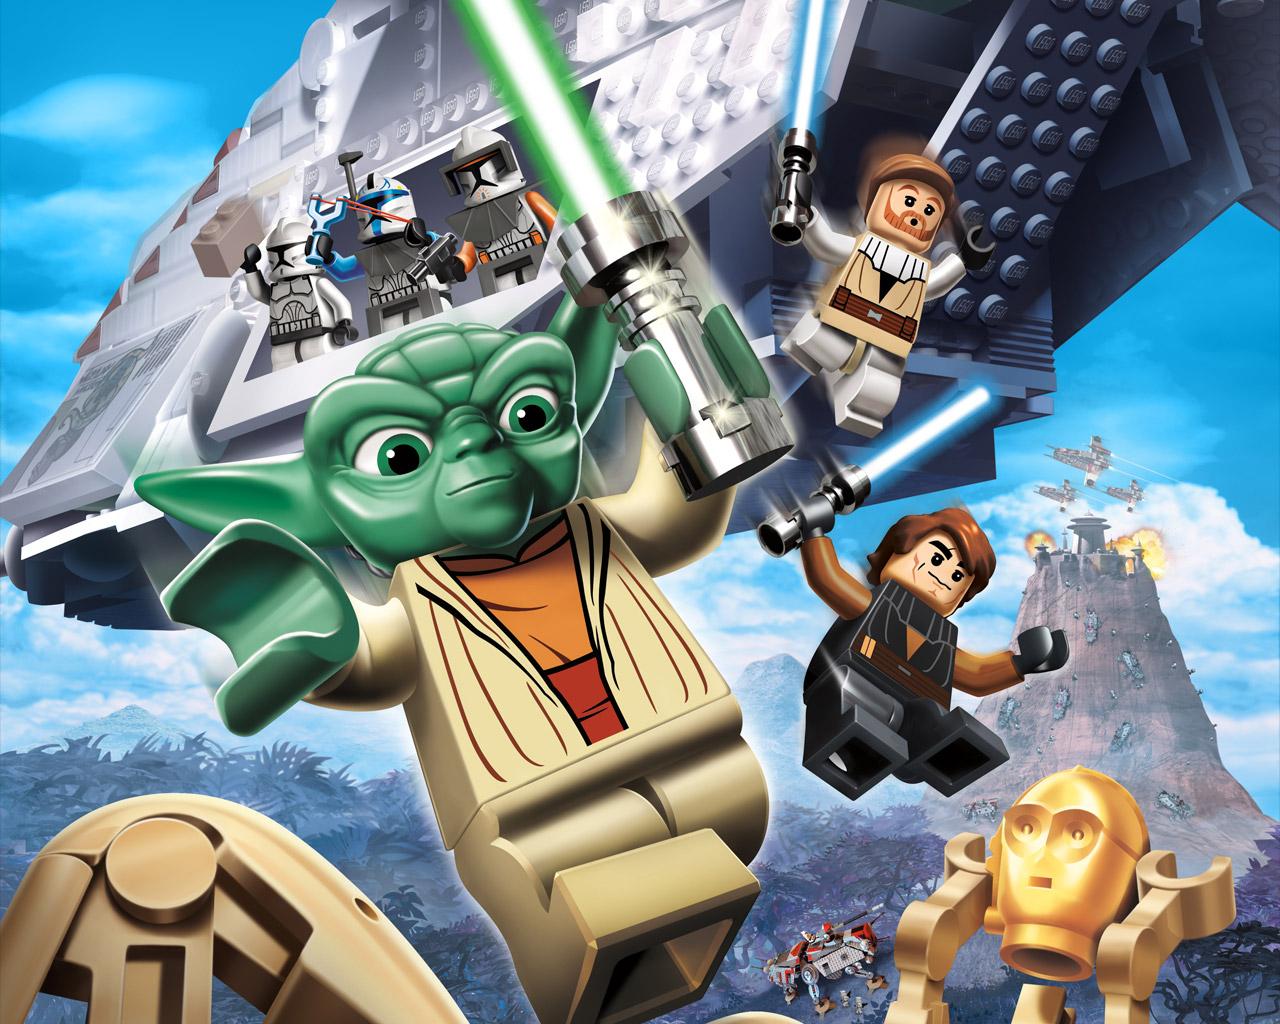 Free Lego Star Wars III: The Clone Wars Wallpaper in 1280x1024